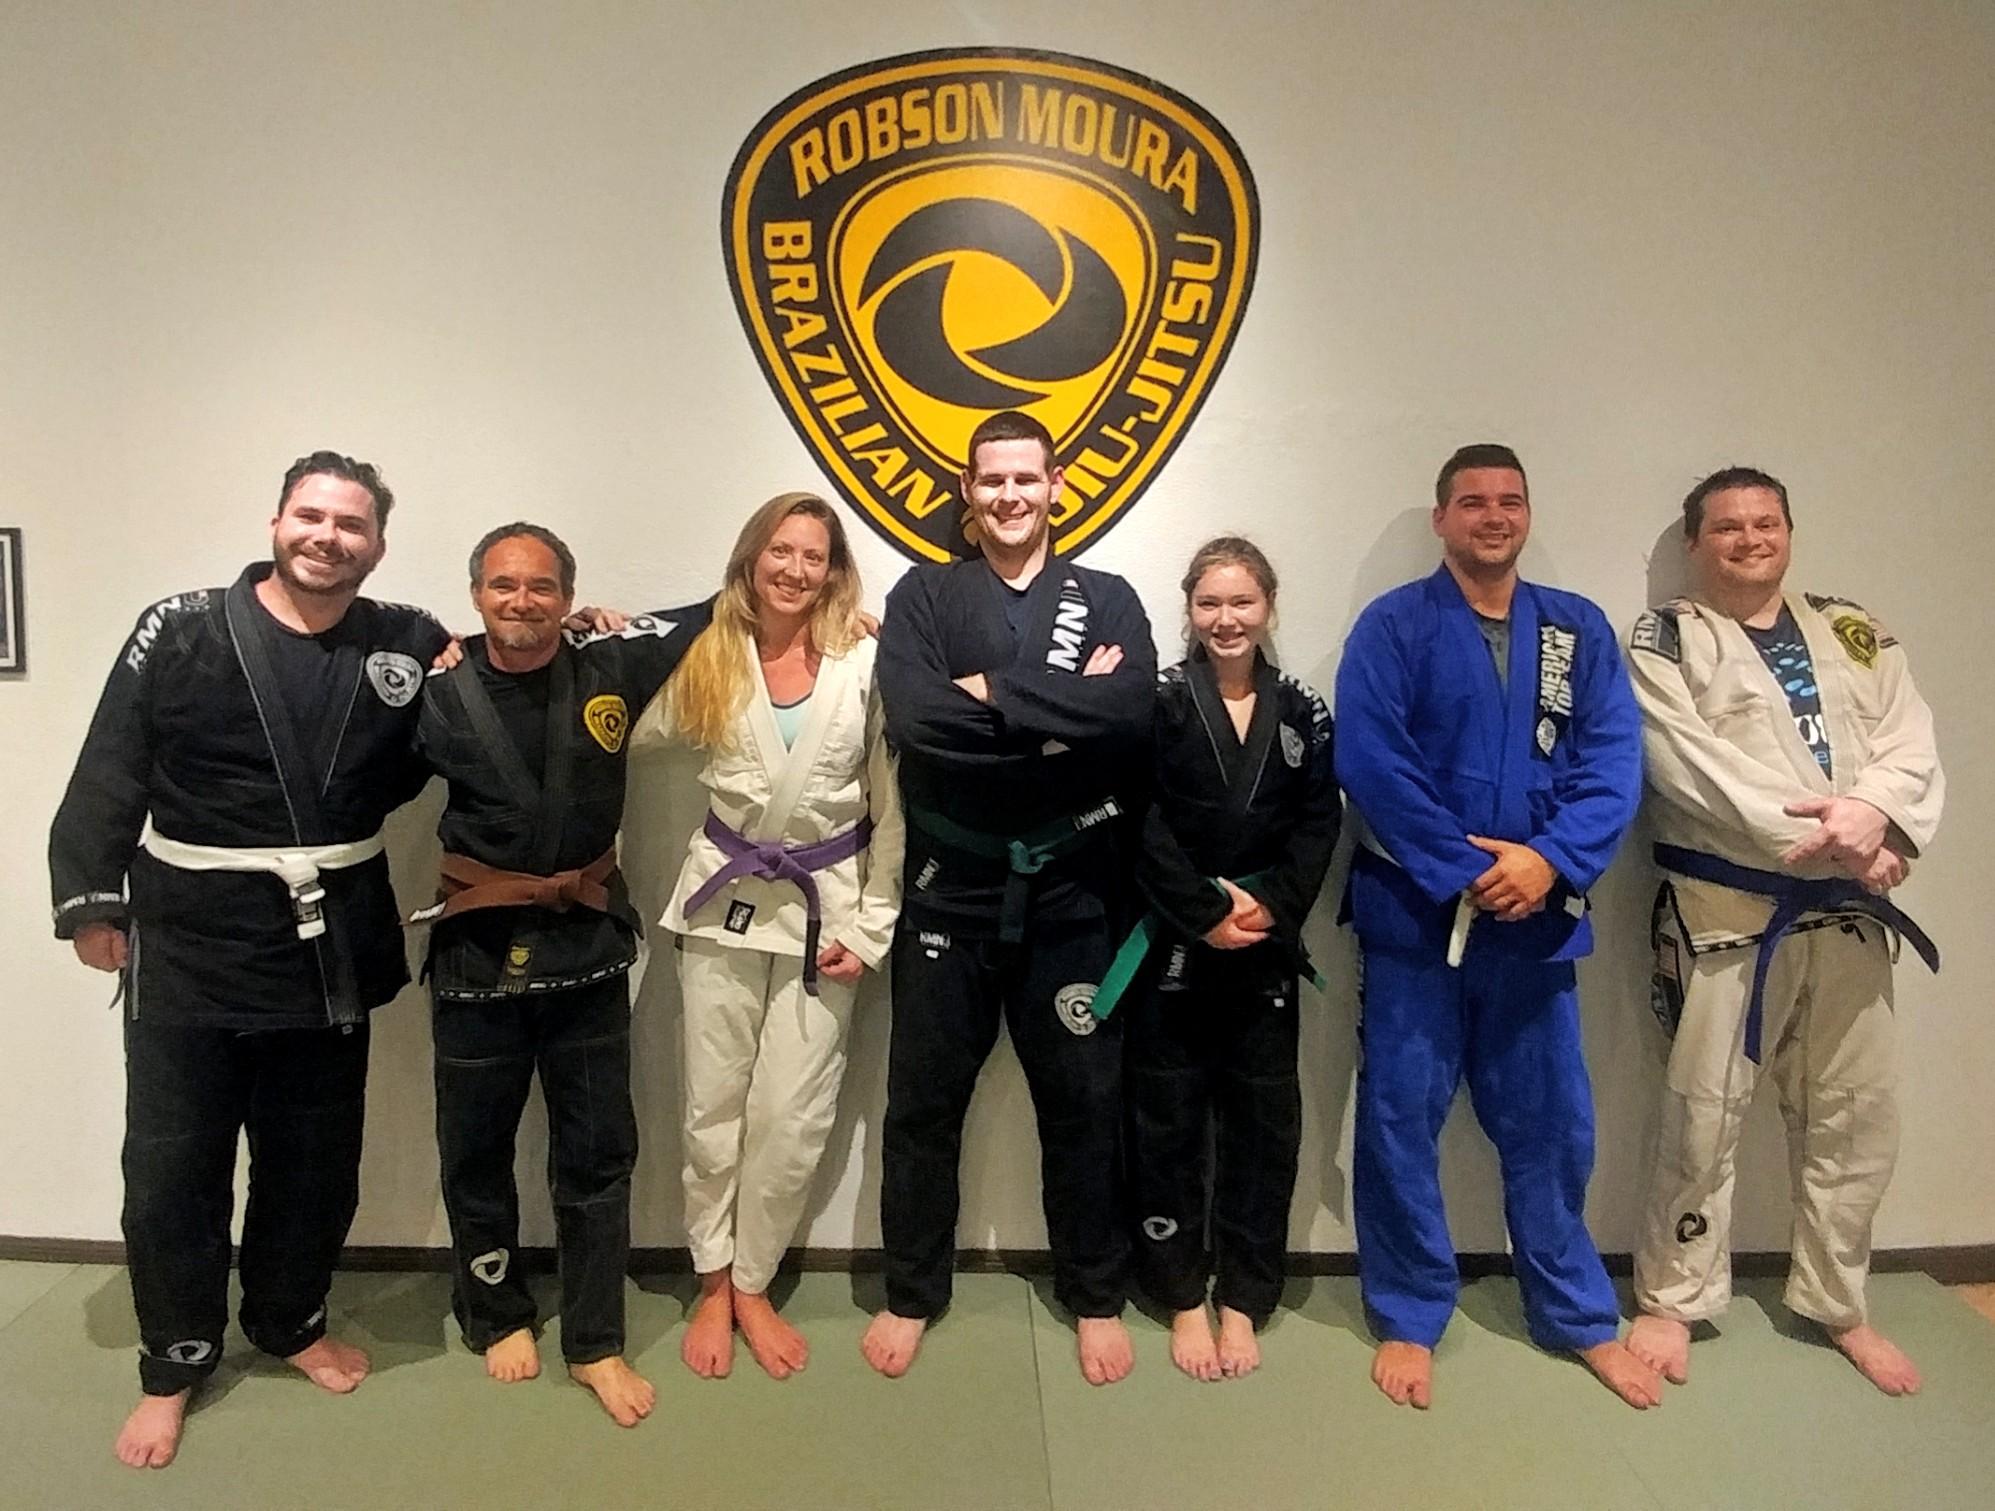 Gator Family Brazilian Jiu-Jitsu Deland, Fl  Martial Arts